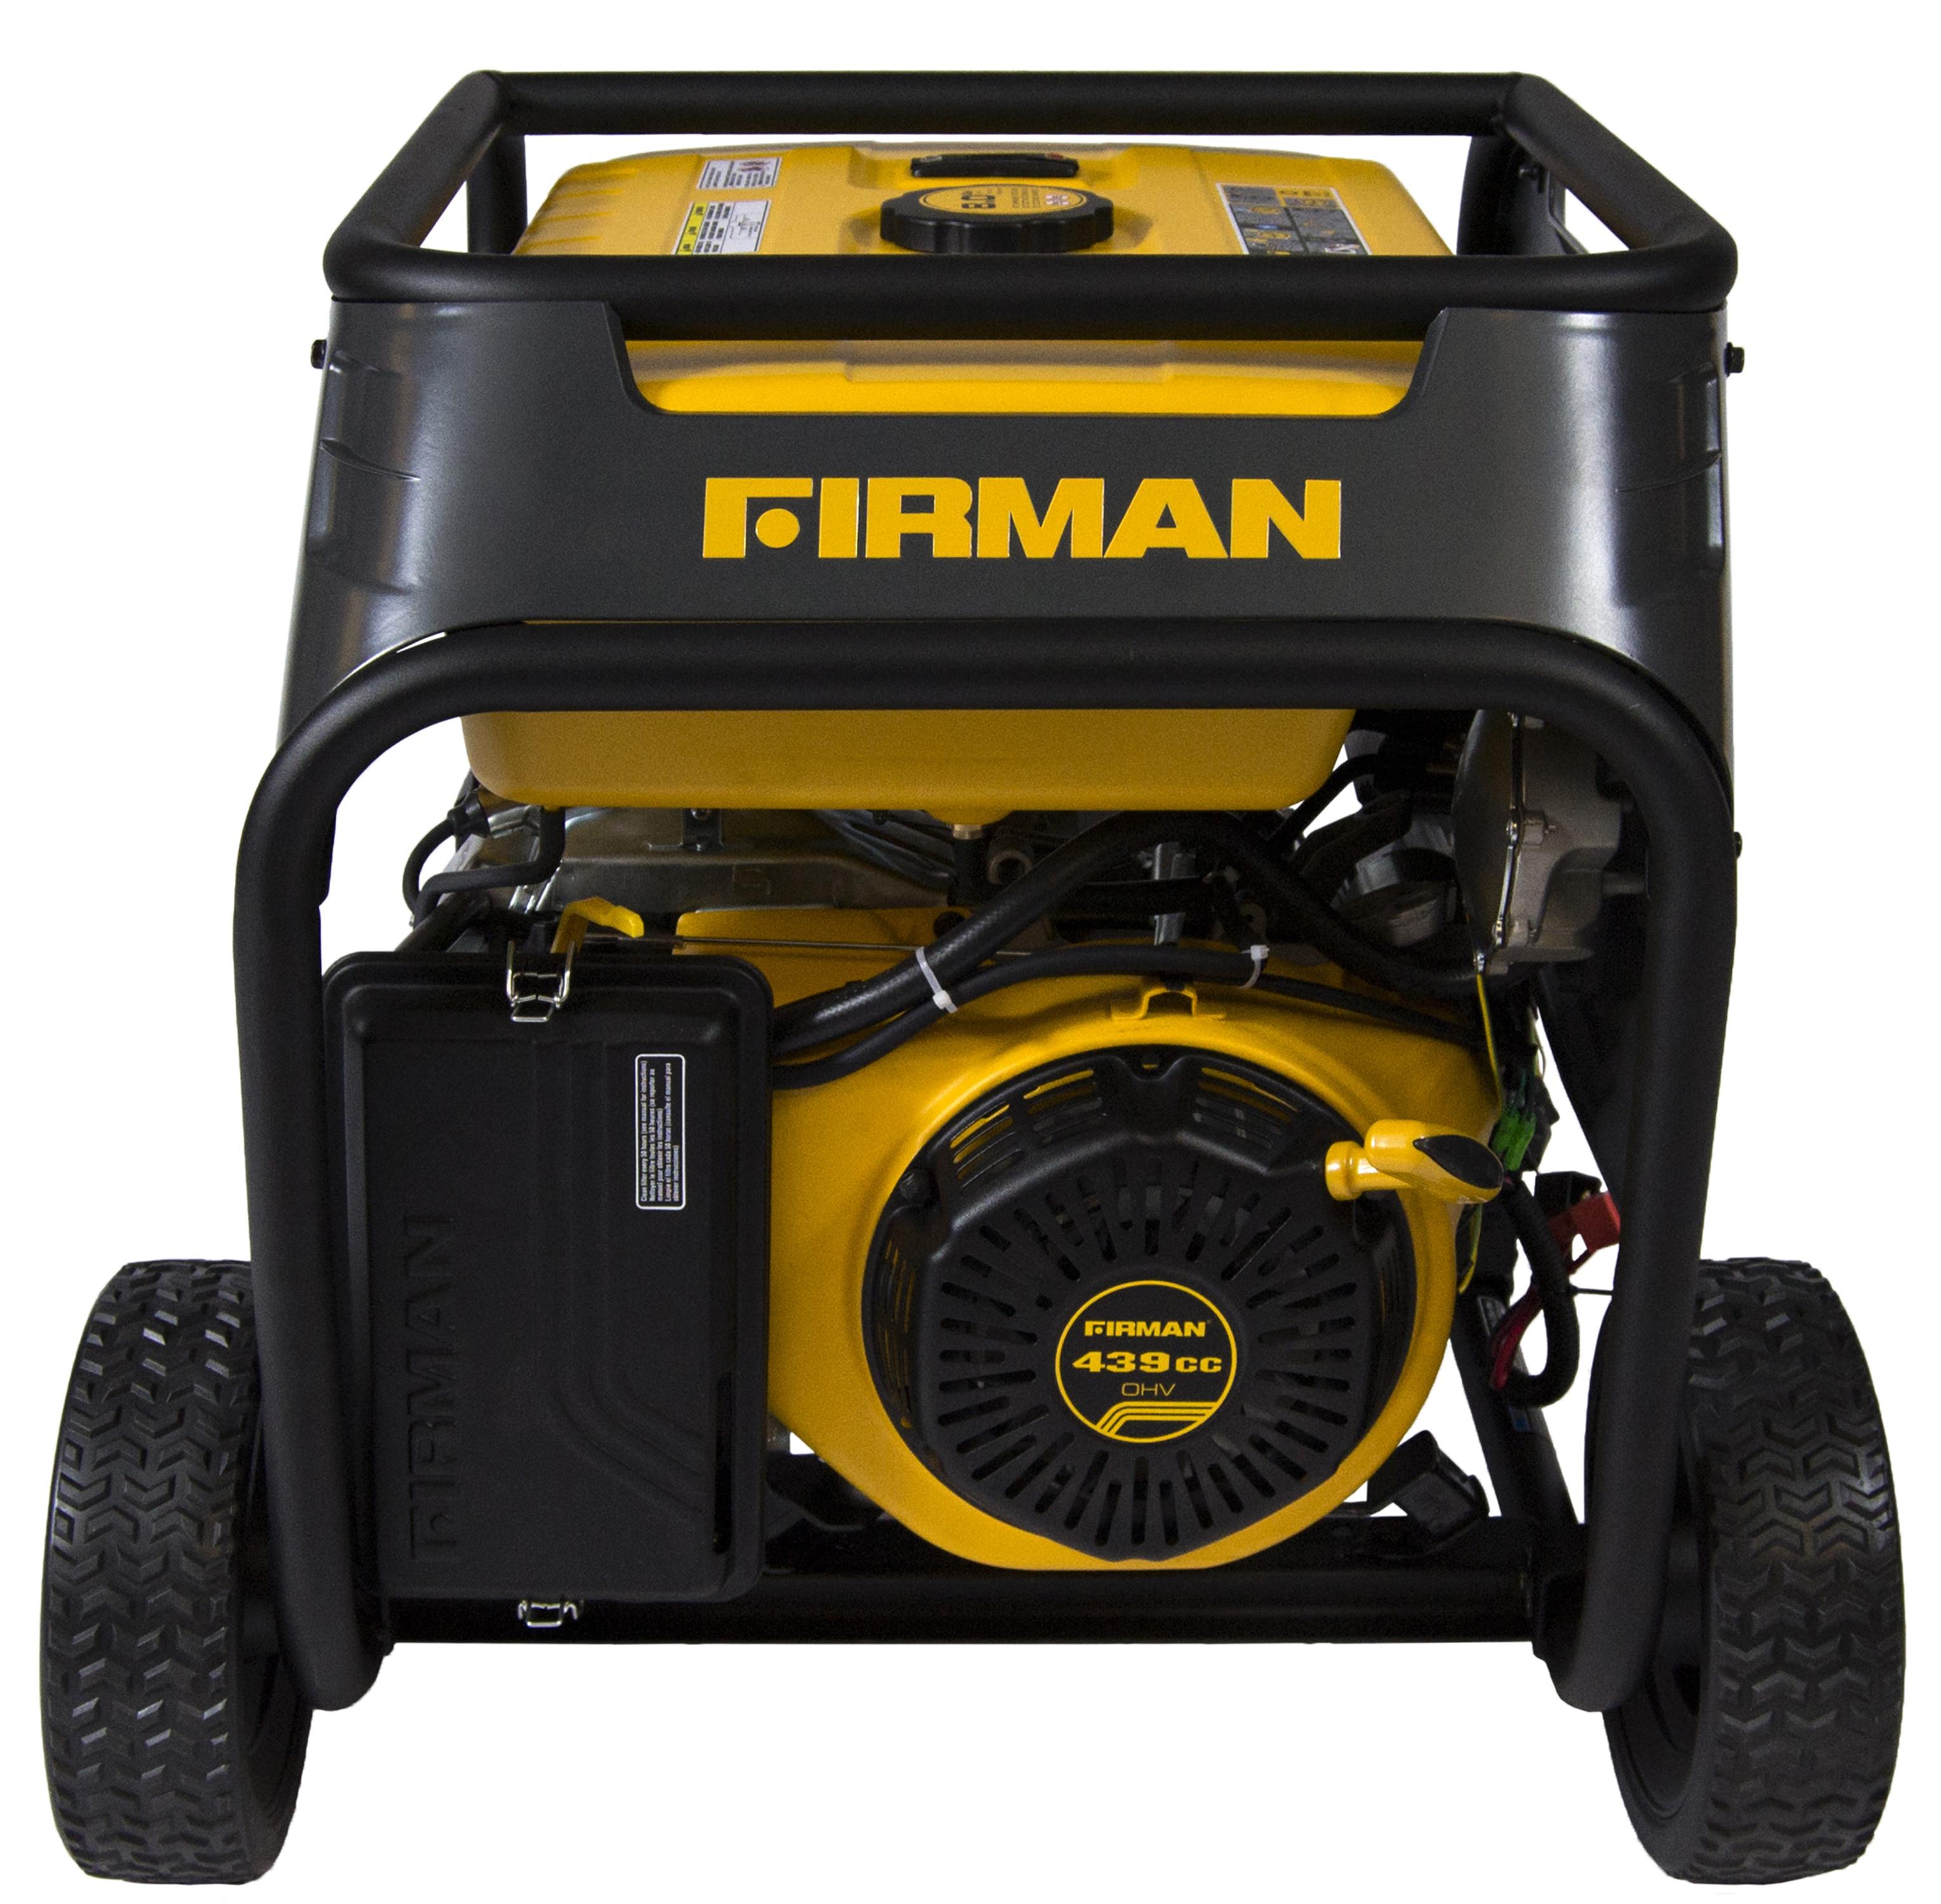 Firman Power Equipment Hybrid Series Dual Fuel Generator 5700 7125